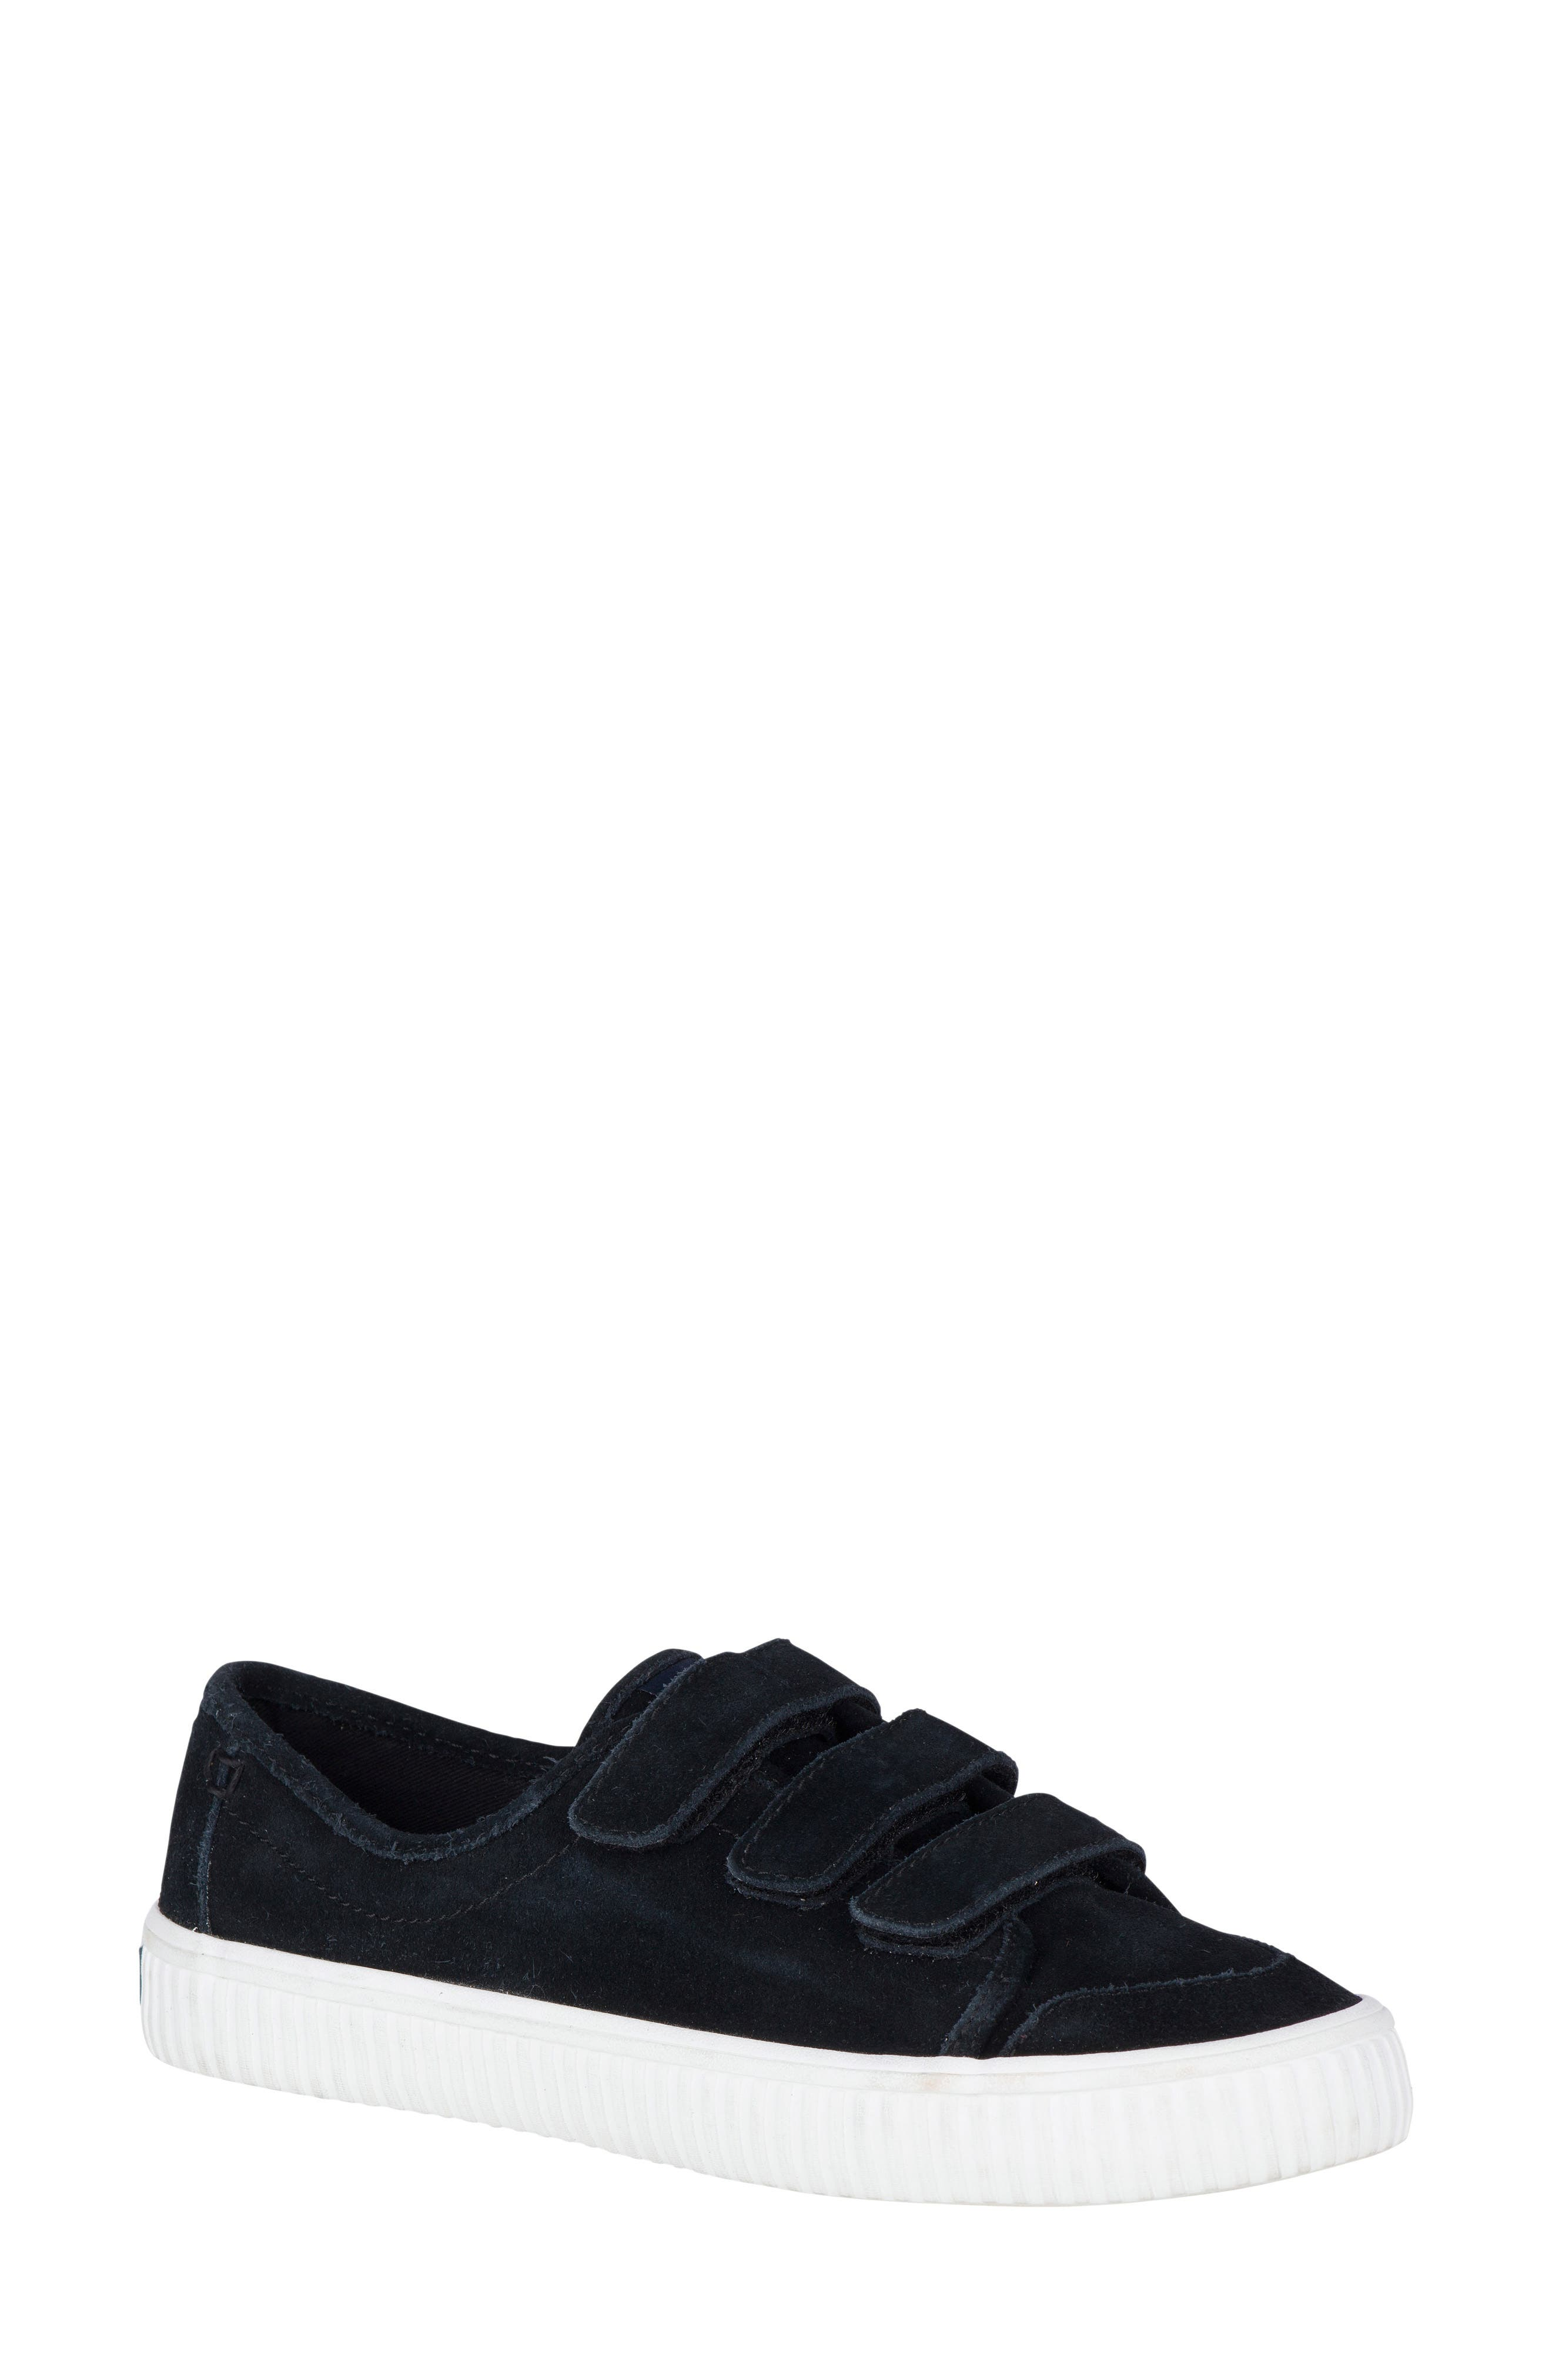 Creeper Sneaker,                         Main,                         color, Black Suede